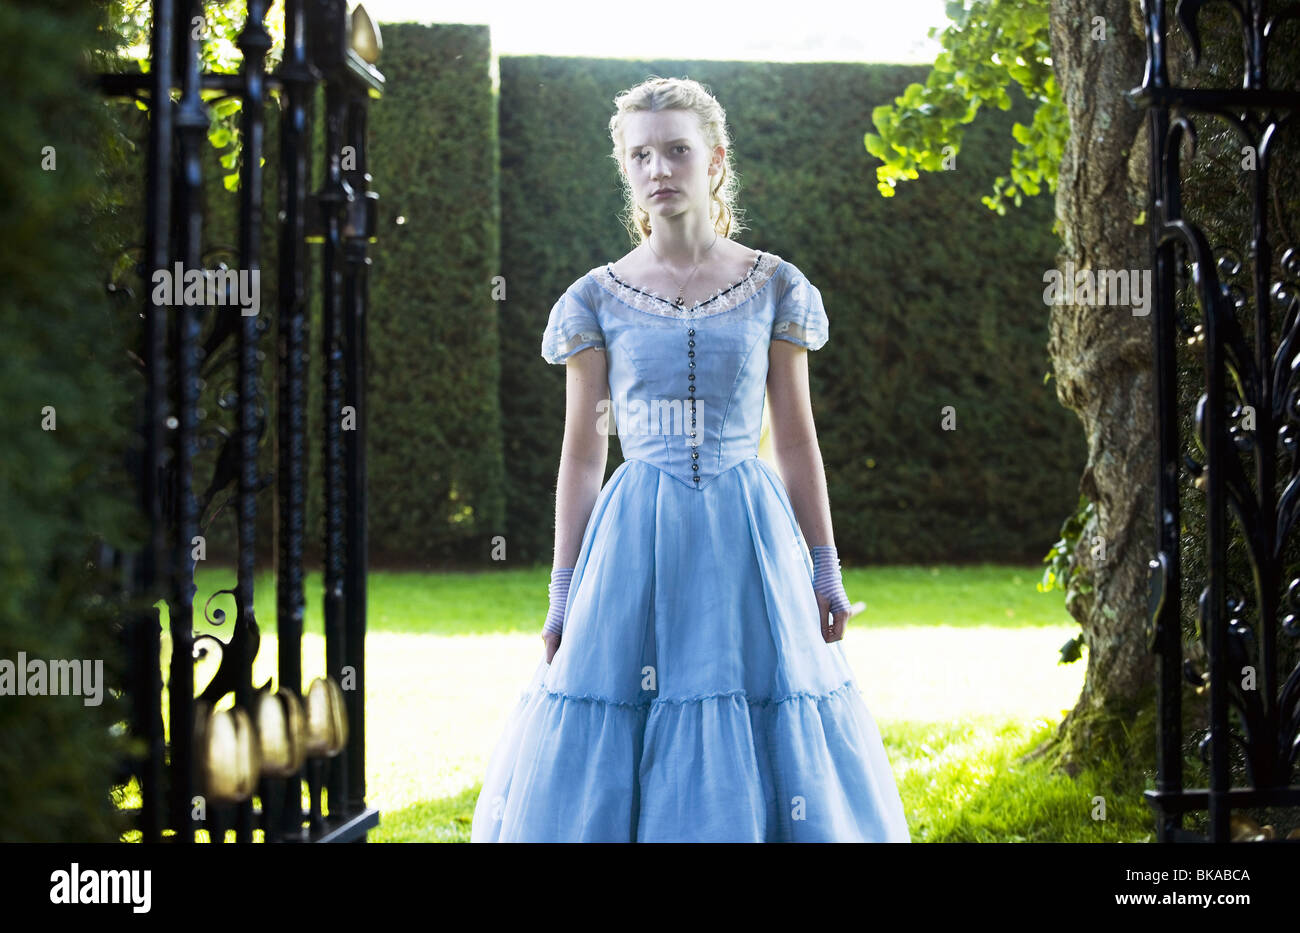 Alice in Wonderland Year: 2010 - USA Director: Tim Burton Mia Wasikowska, - Stock Image